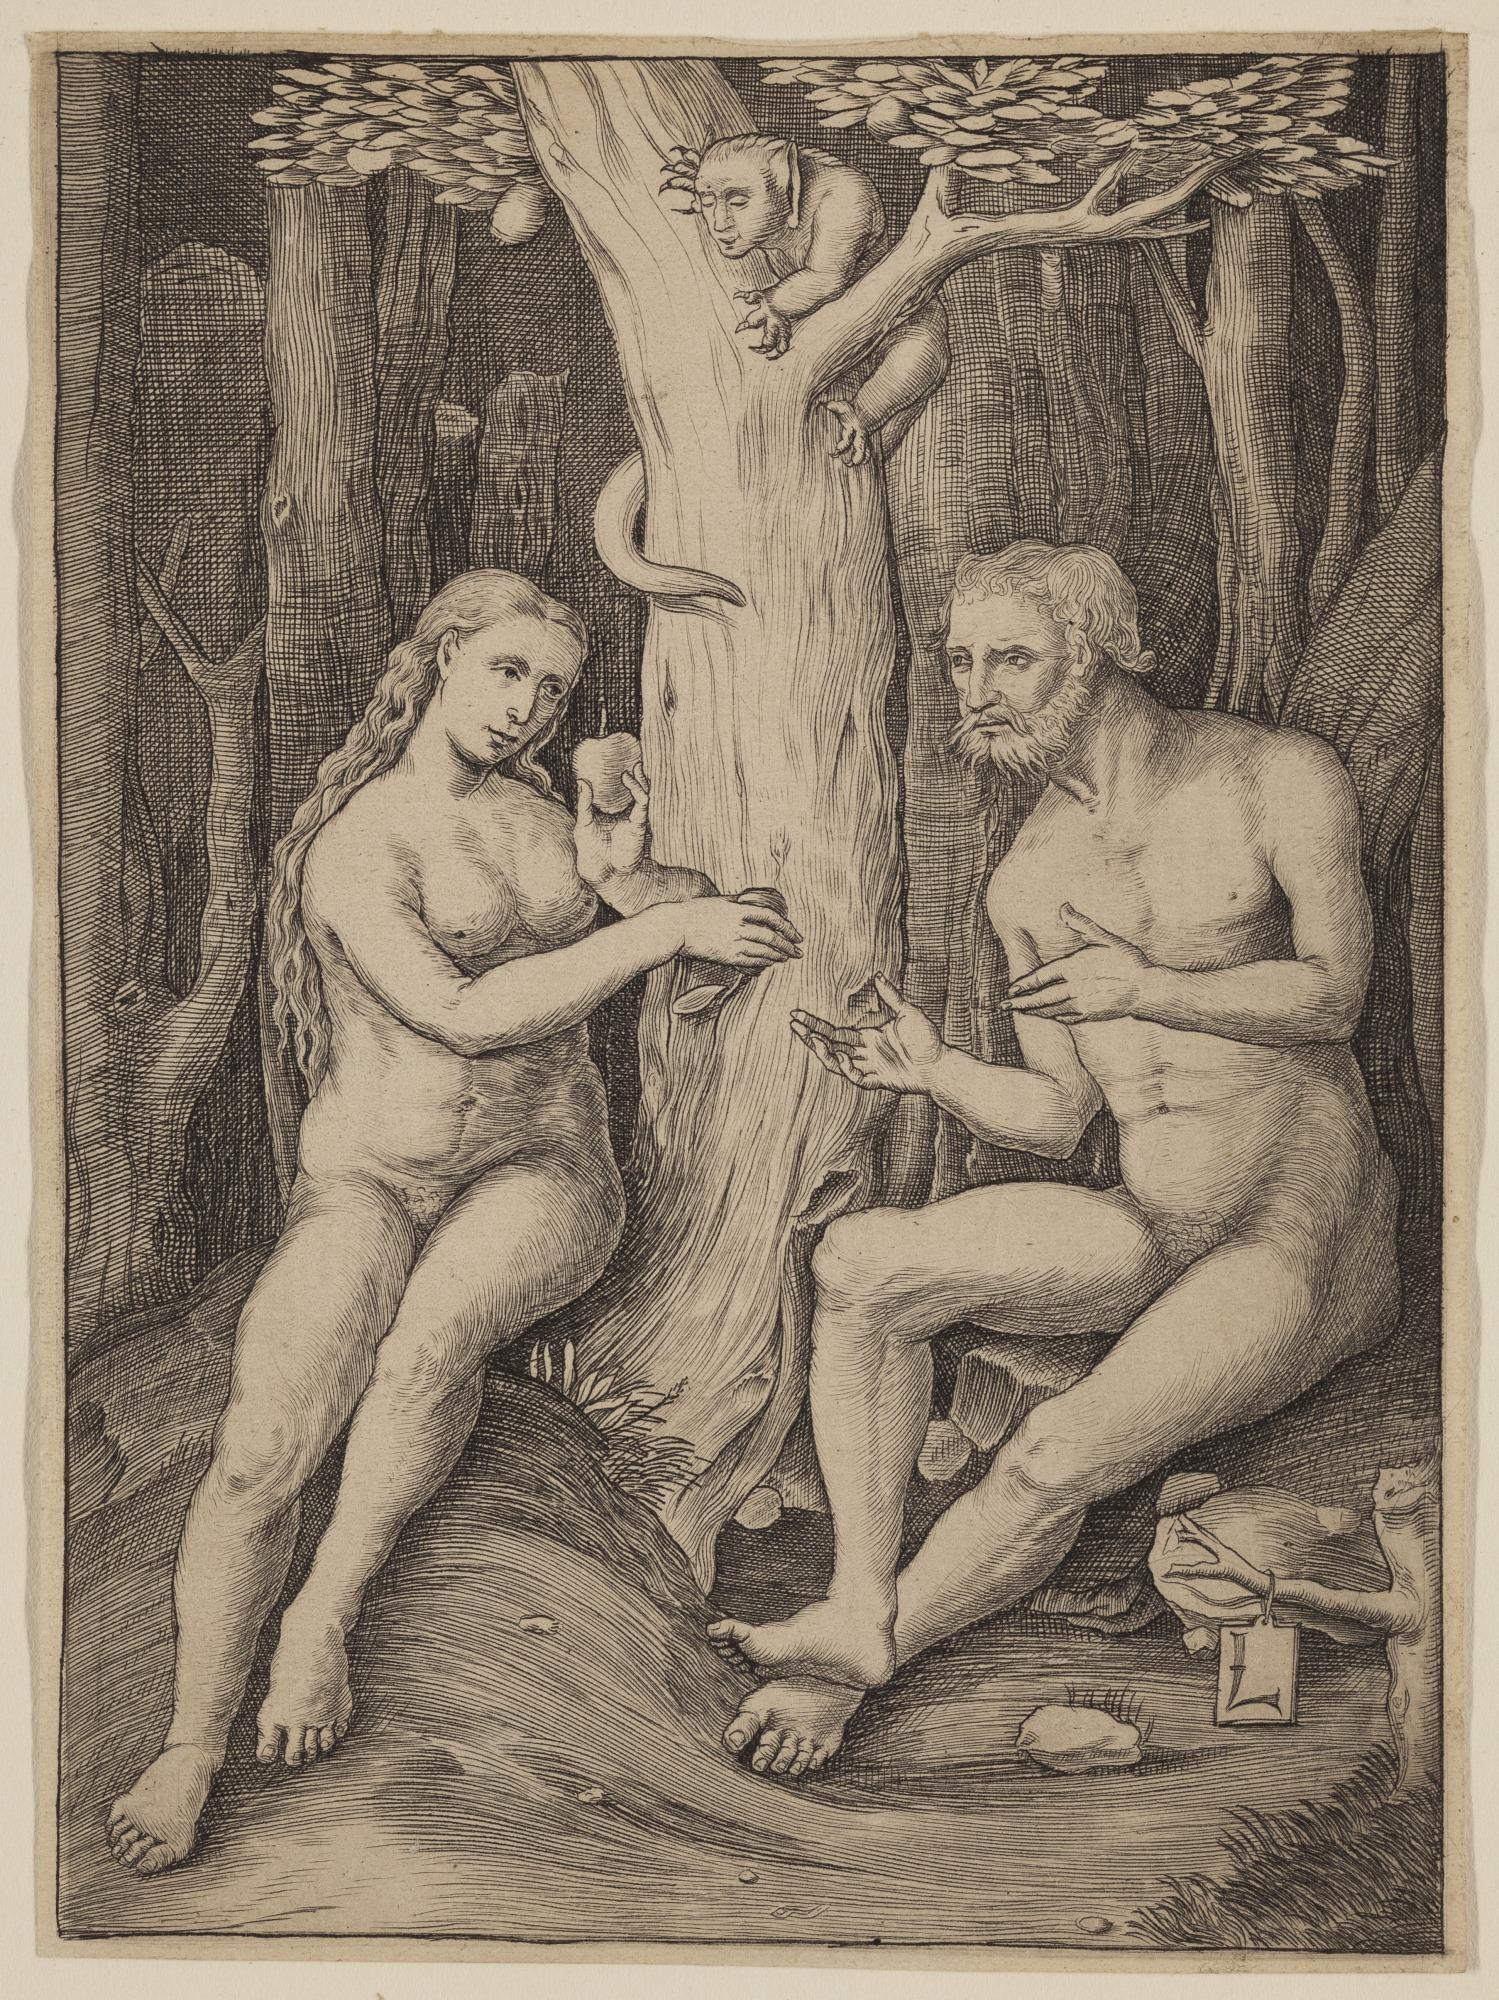 1499x2000 Fall Of Adam And Eve Detroit Institute Of Arts Museum